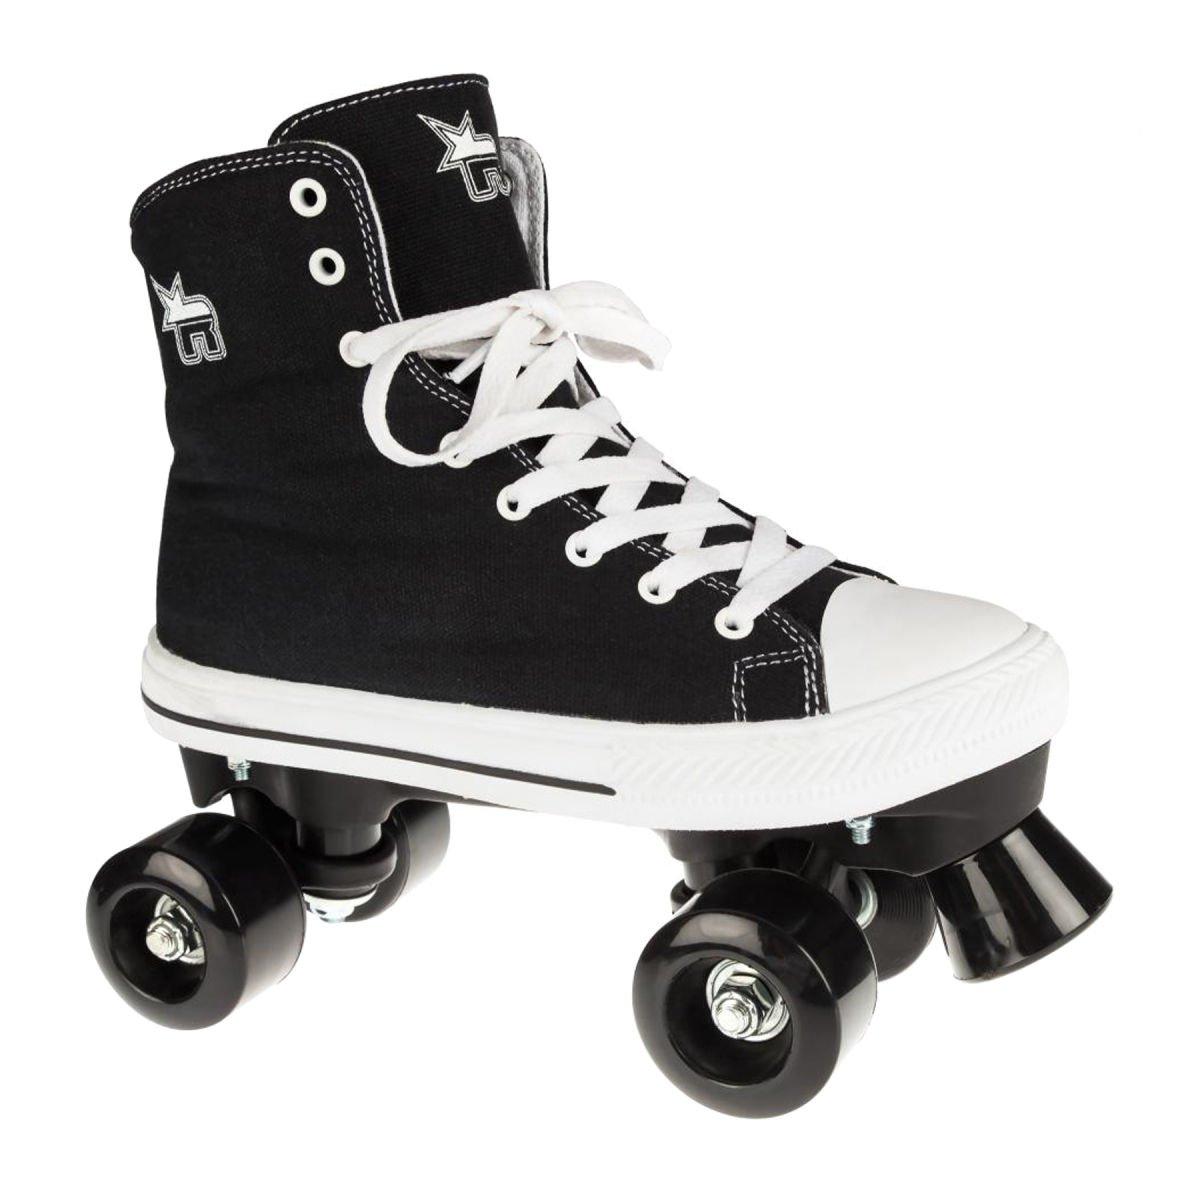 Rookie roller skates amazon - Rookie Roller Skates Amazon 5